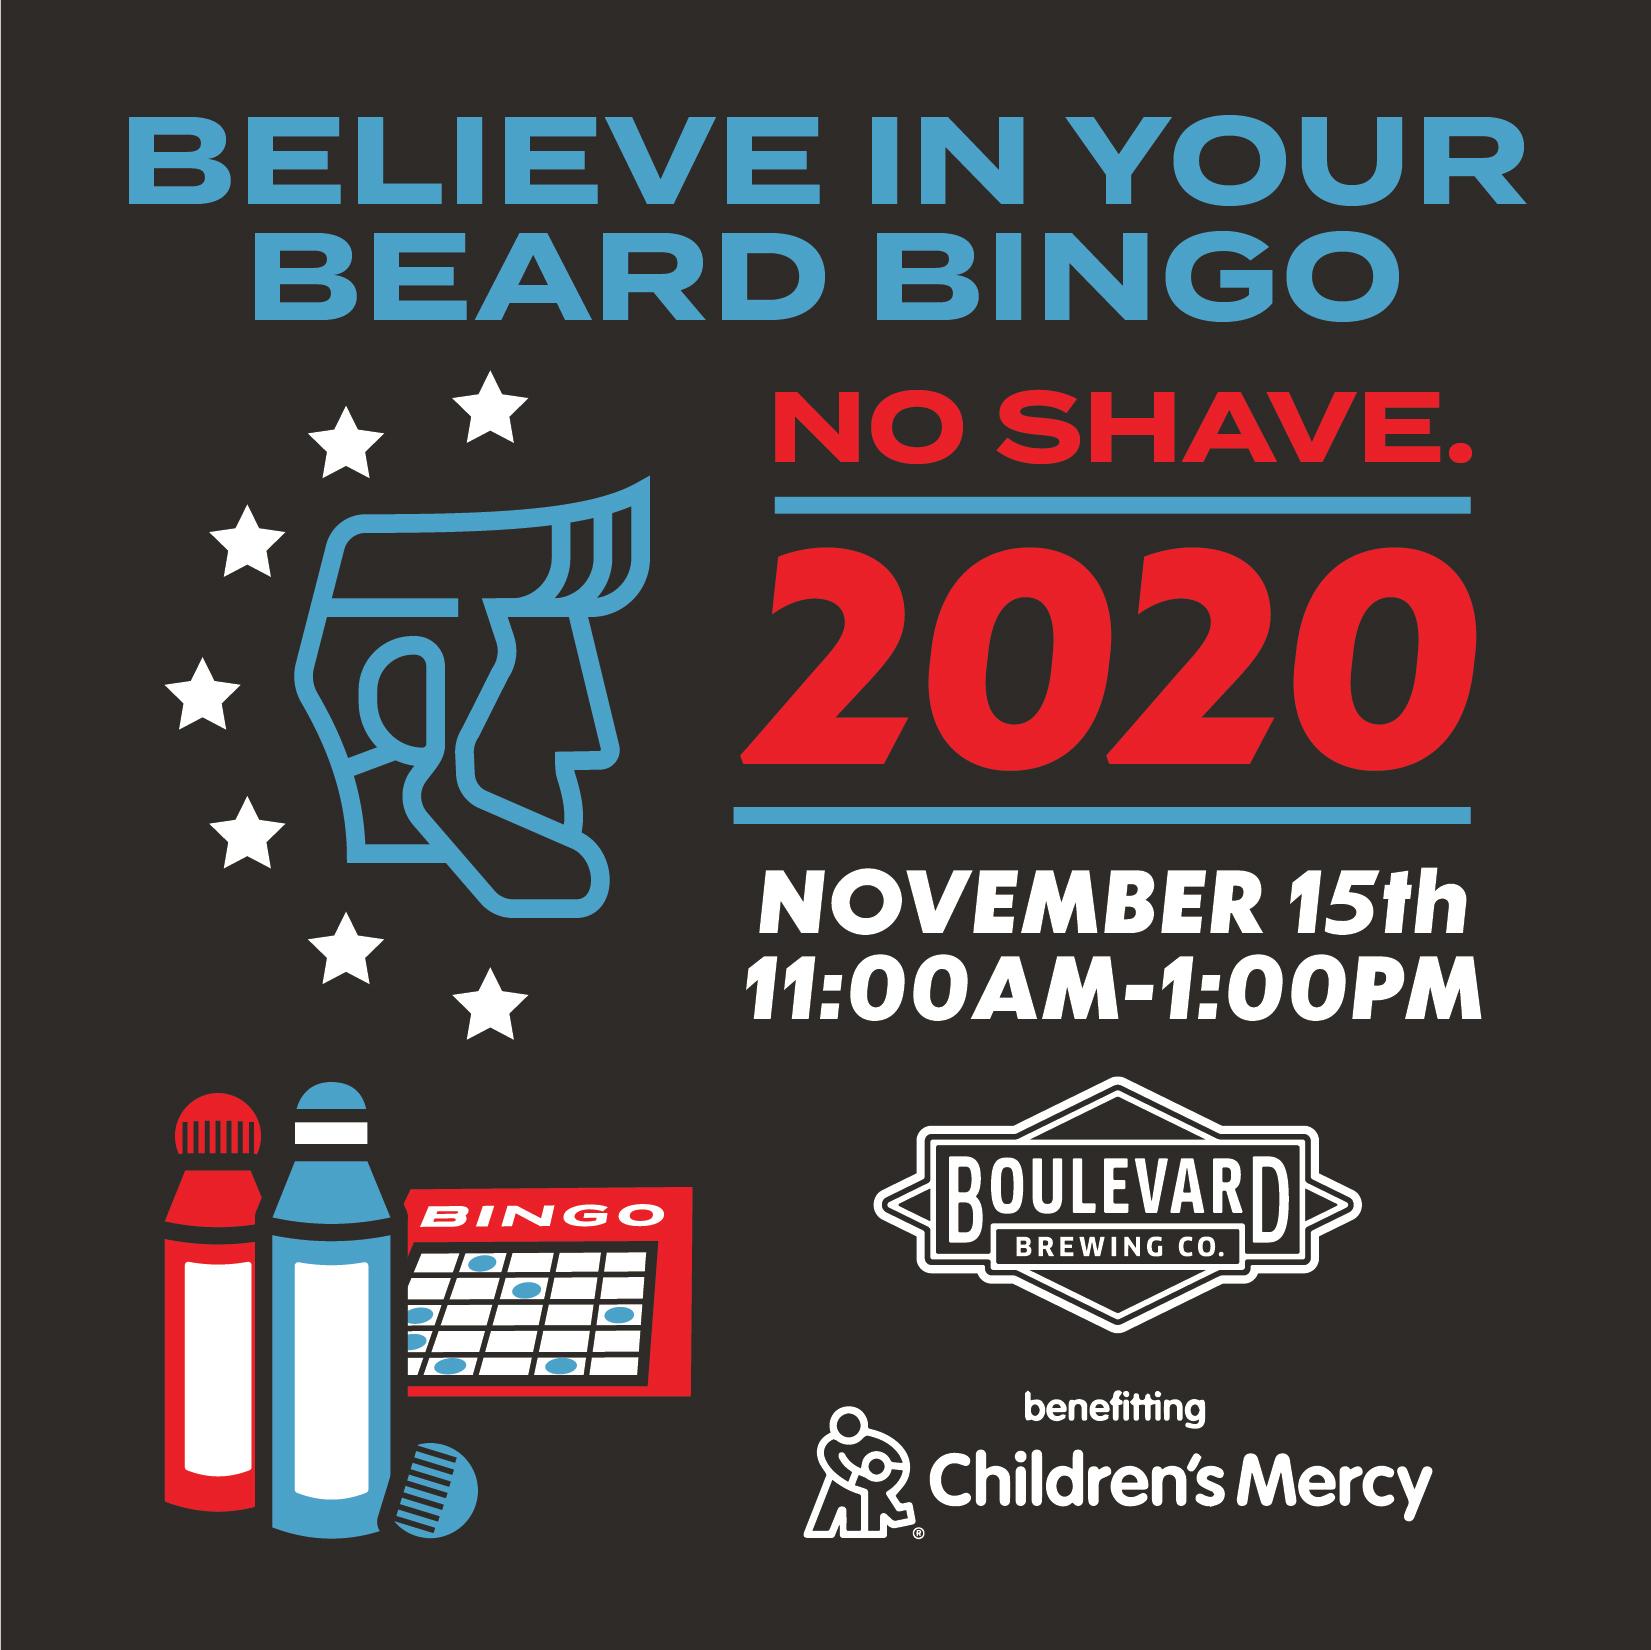 believe in your beard bingo 2020